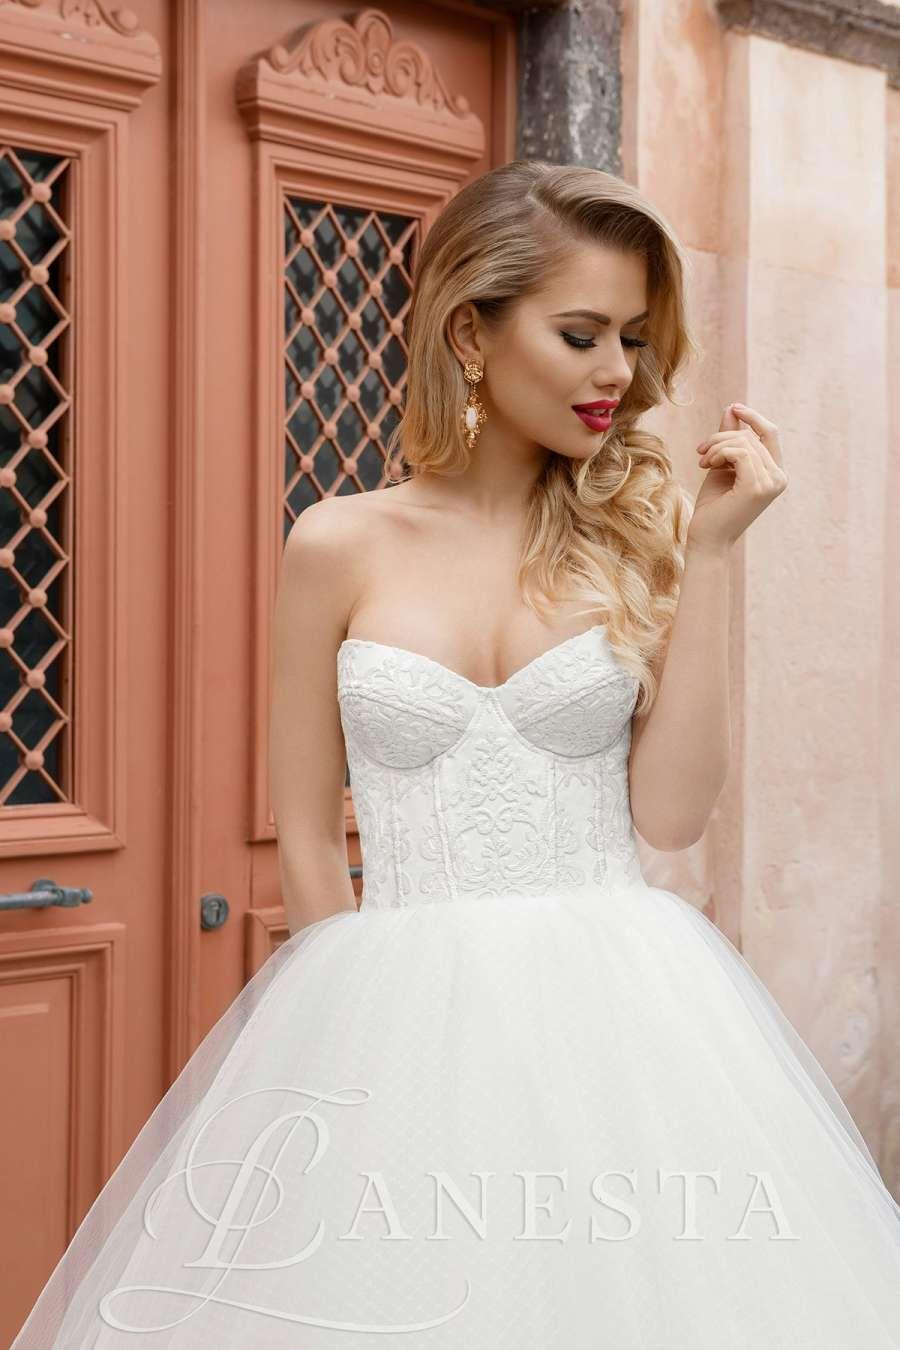 Cece wedding dress  Sharlotta  Wedding Photos  Pinterest  Beautiful wedding gowns